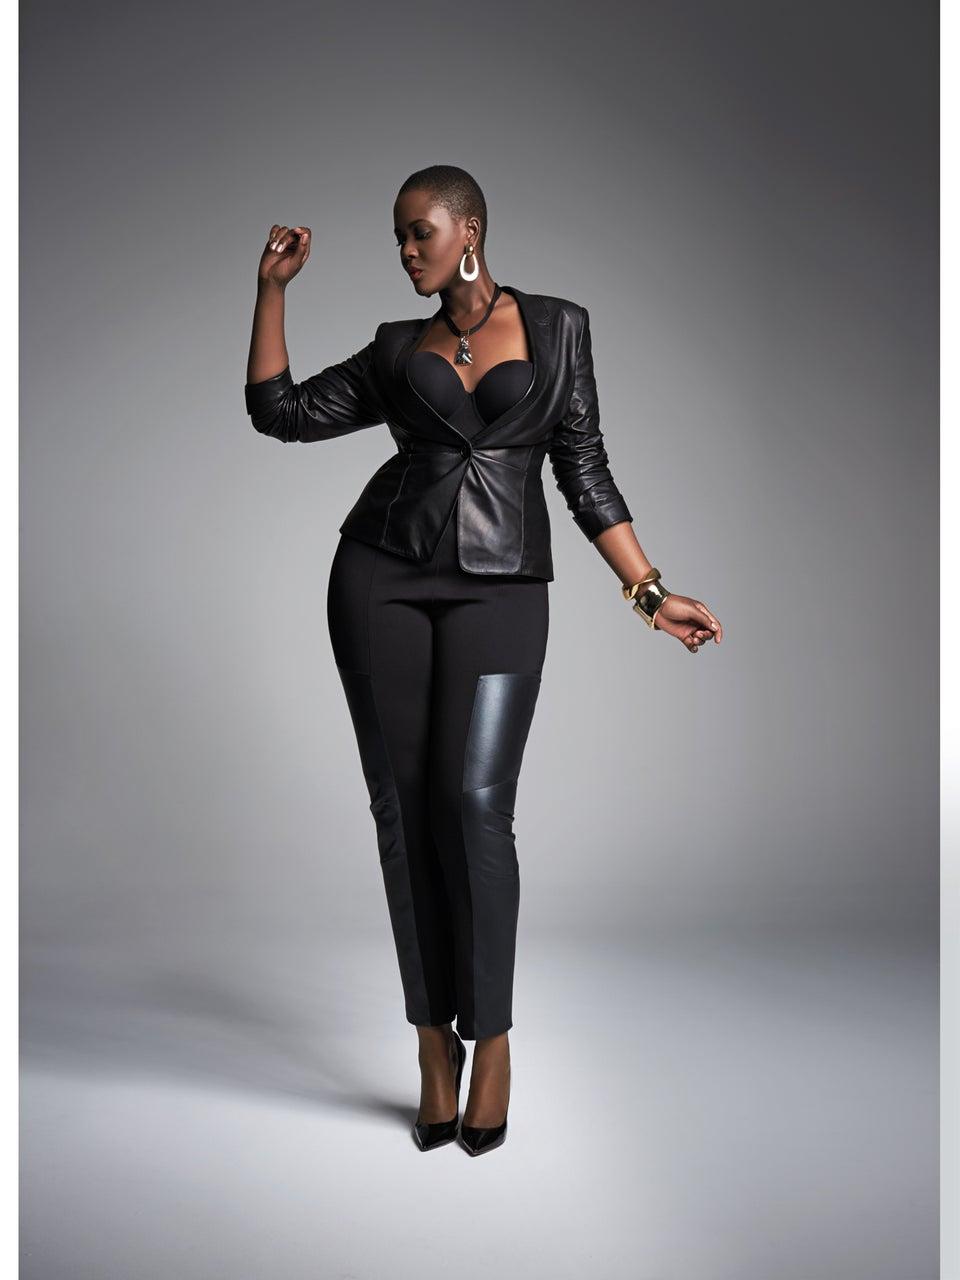 Curvy Model of The Month: Philomena Kwao